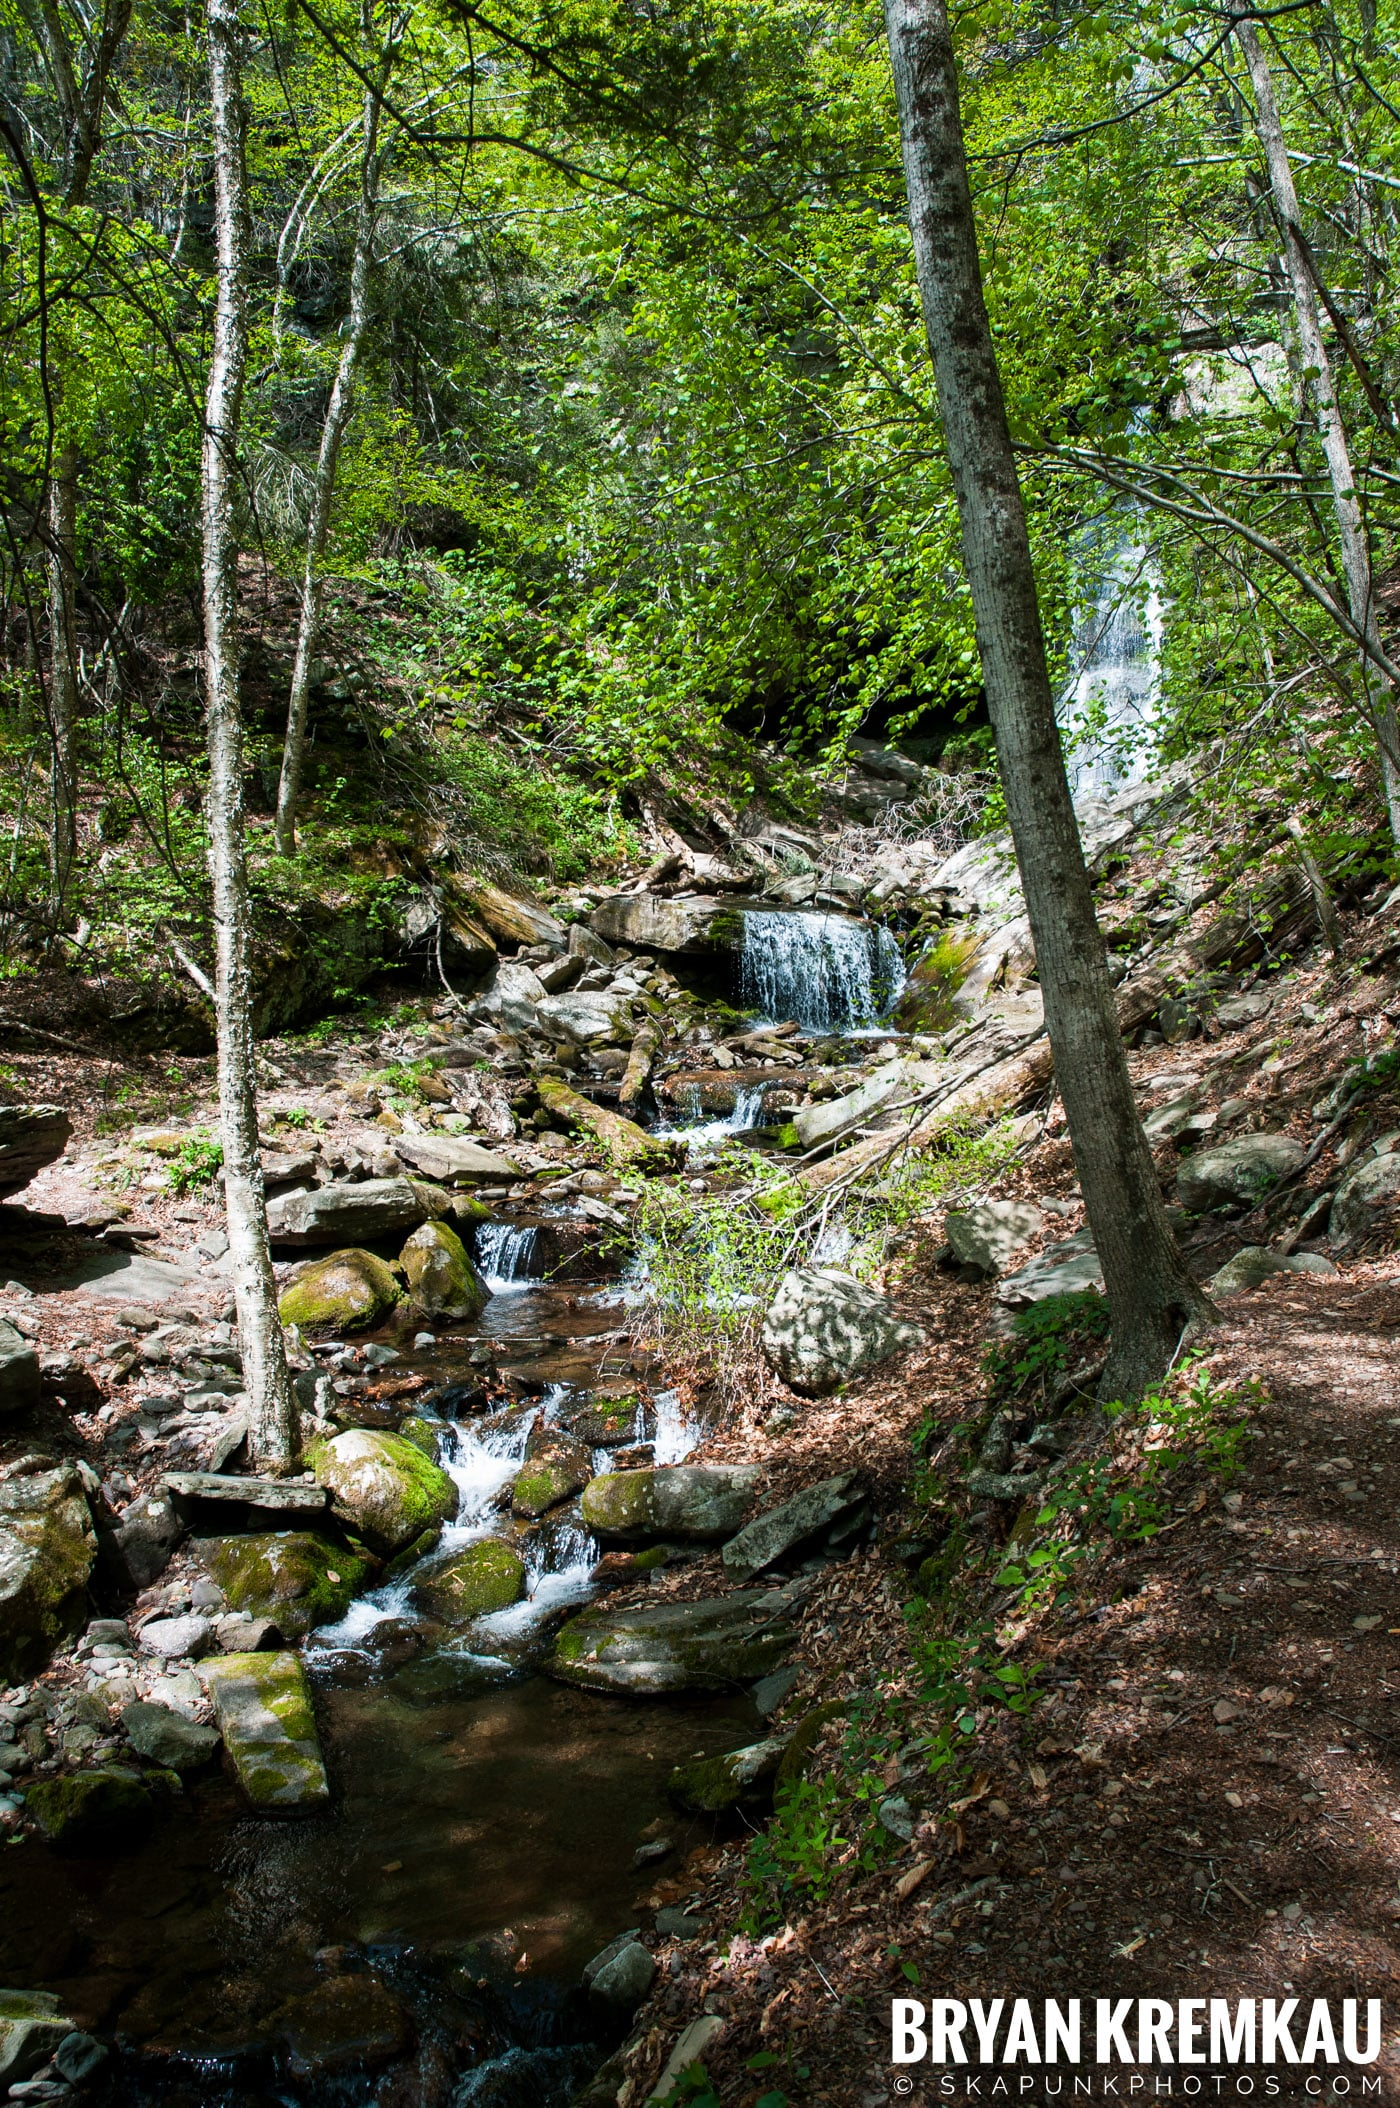 Getting Engaged @ Peekamoose Waterfall, Sundown NY - 5.1.10 (31)